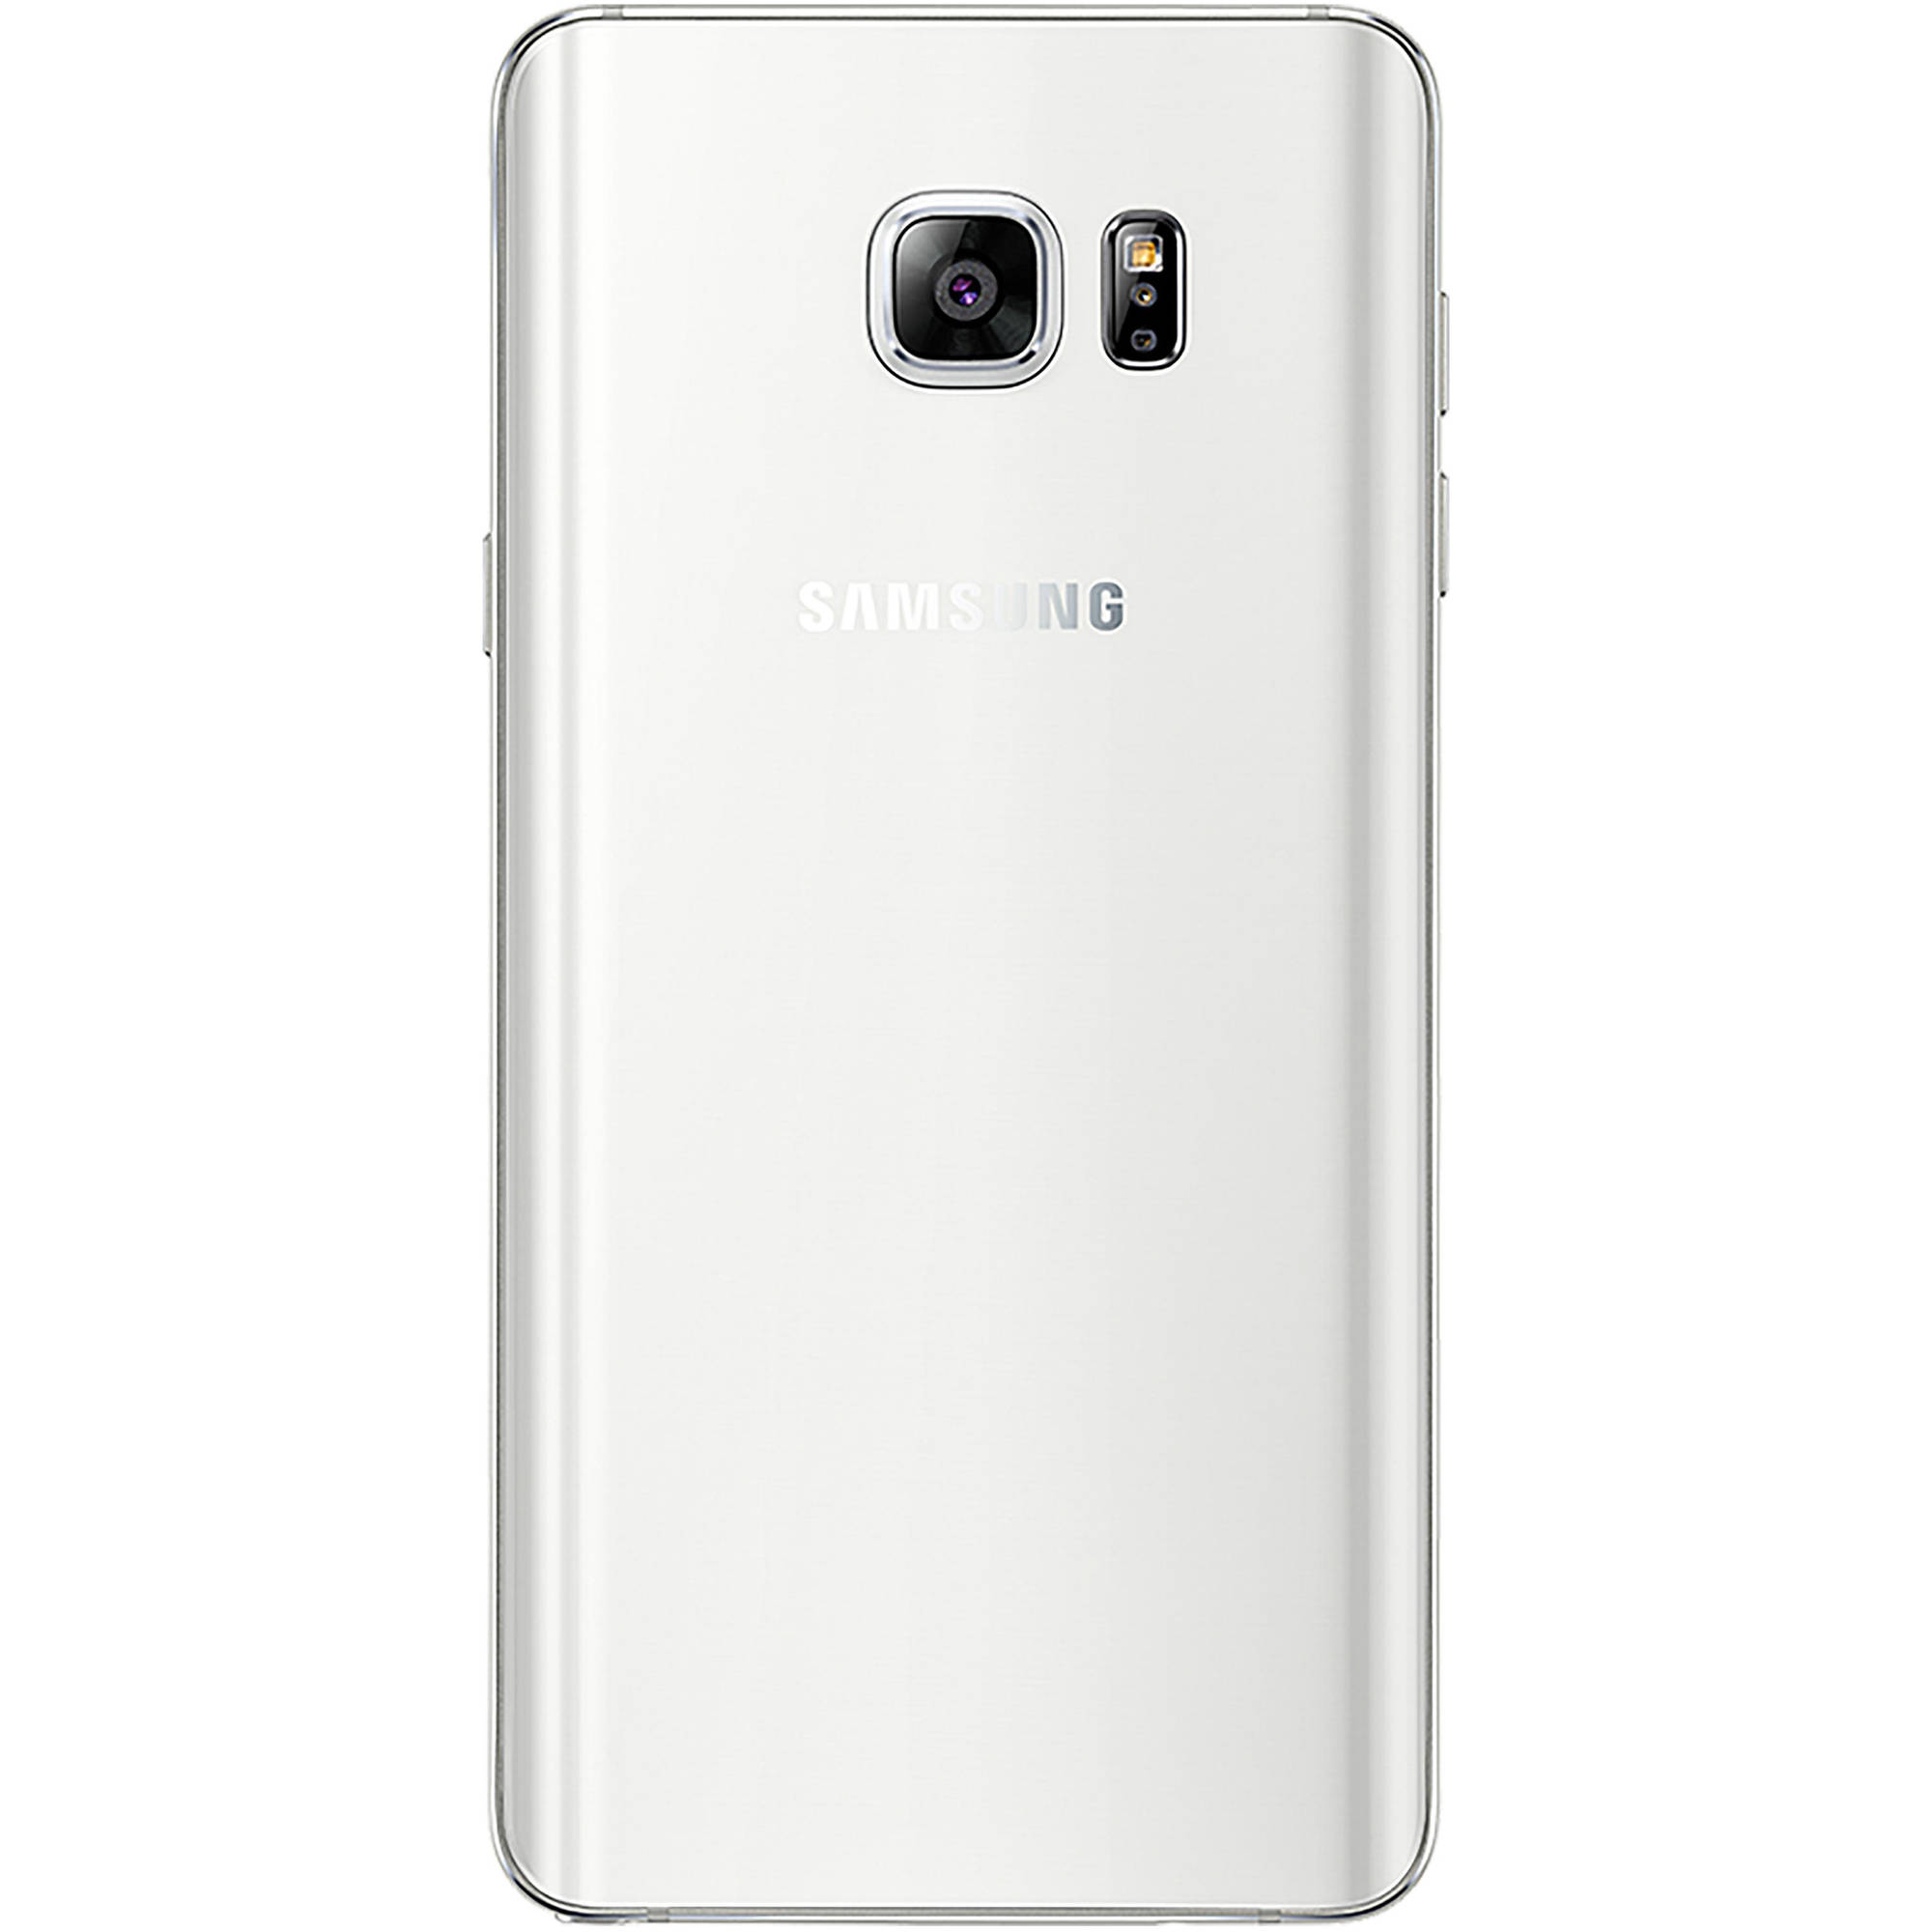 Samsung Galaxy Note 5 N920G 32GB GSM LTE Octa Core Smartphone Unlocked